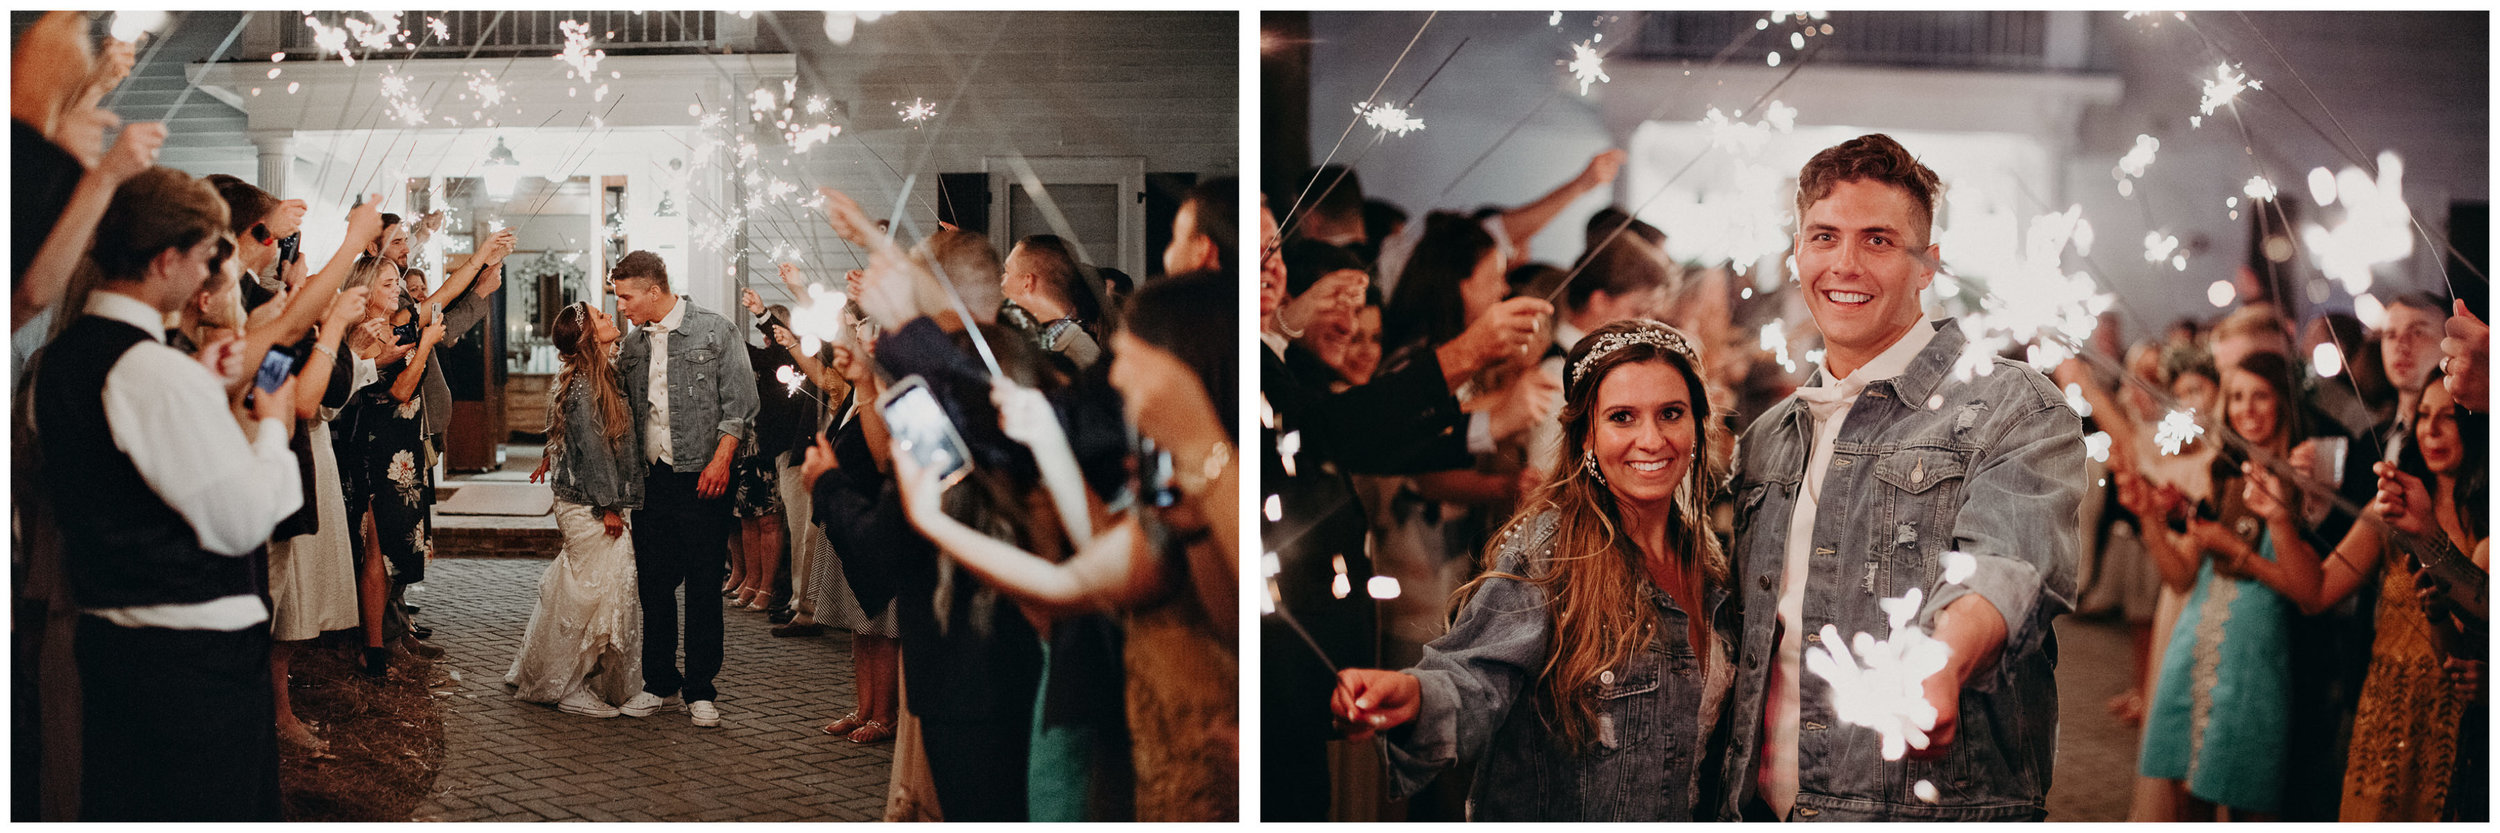 99Carl House Wedding Venue Ga, Atlanta Wedding Photographer - Boho, Bohemian, Junebug Weddings, Vintage, Retro, Trendy. Aline Marin Photography. .jpg